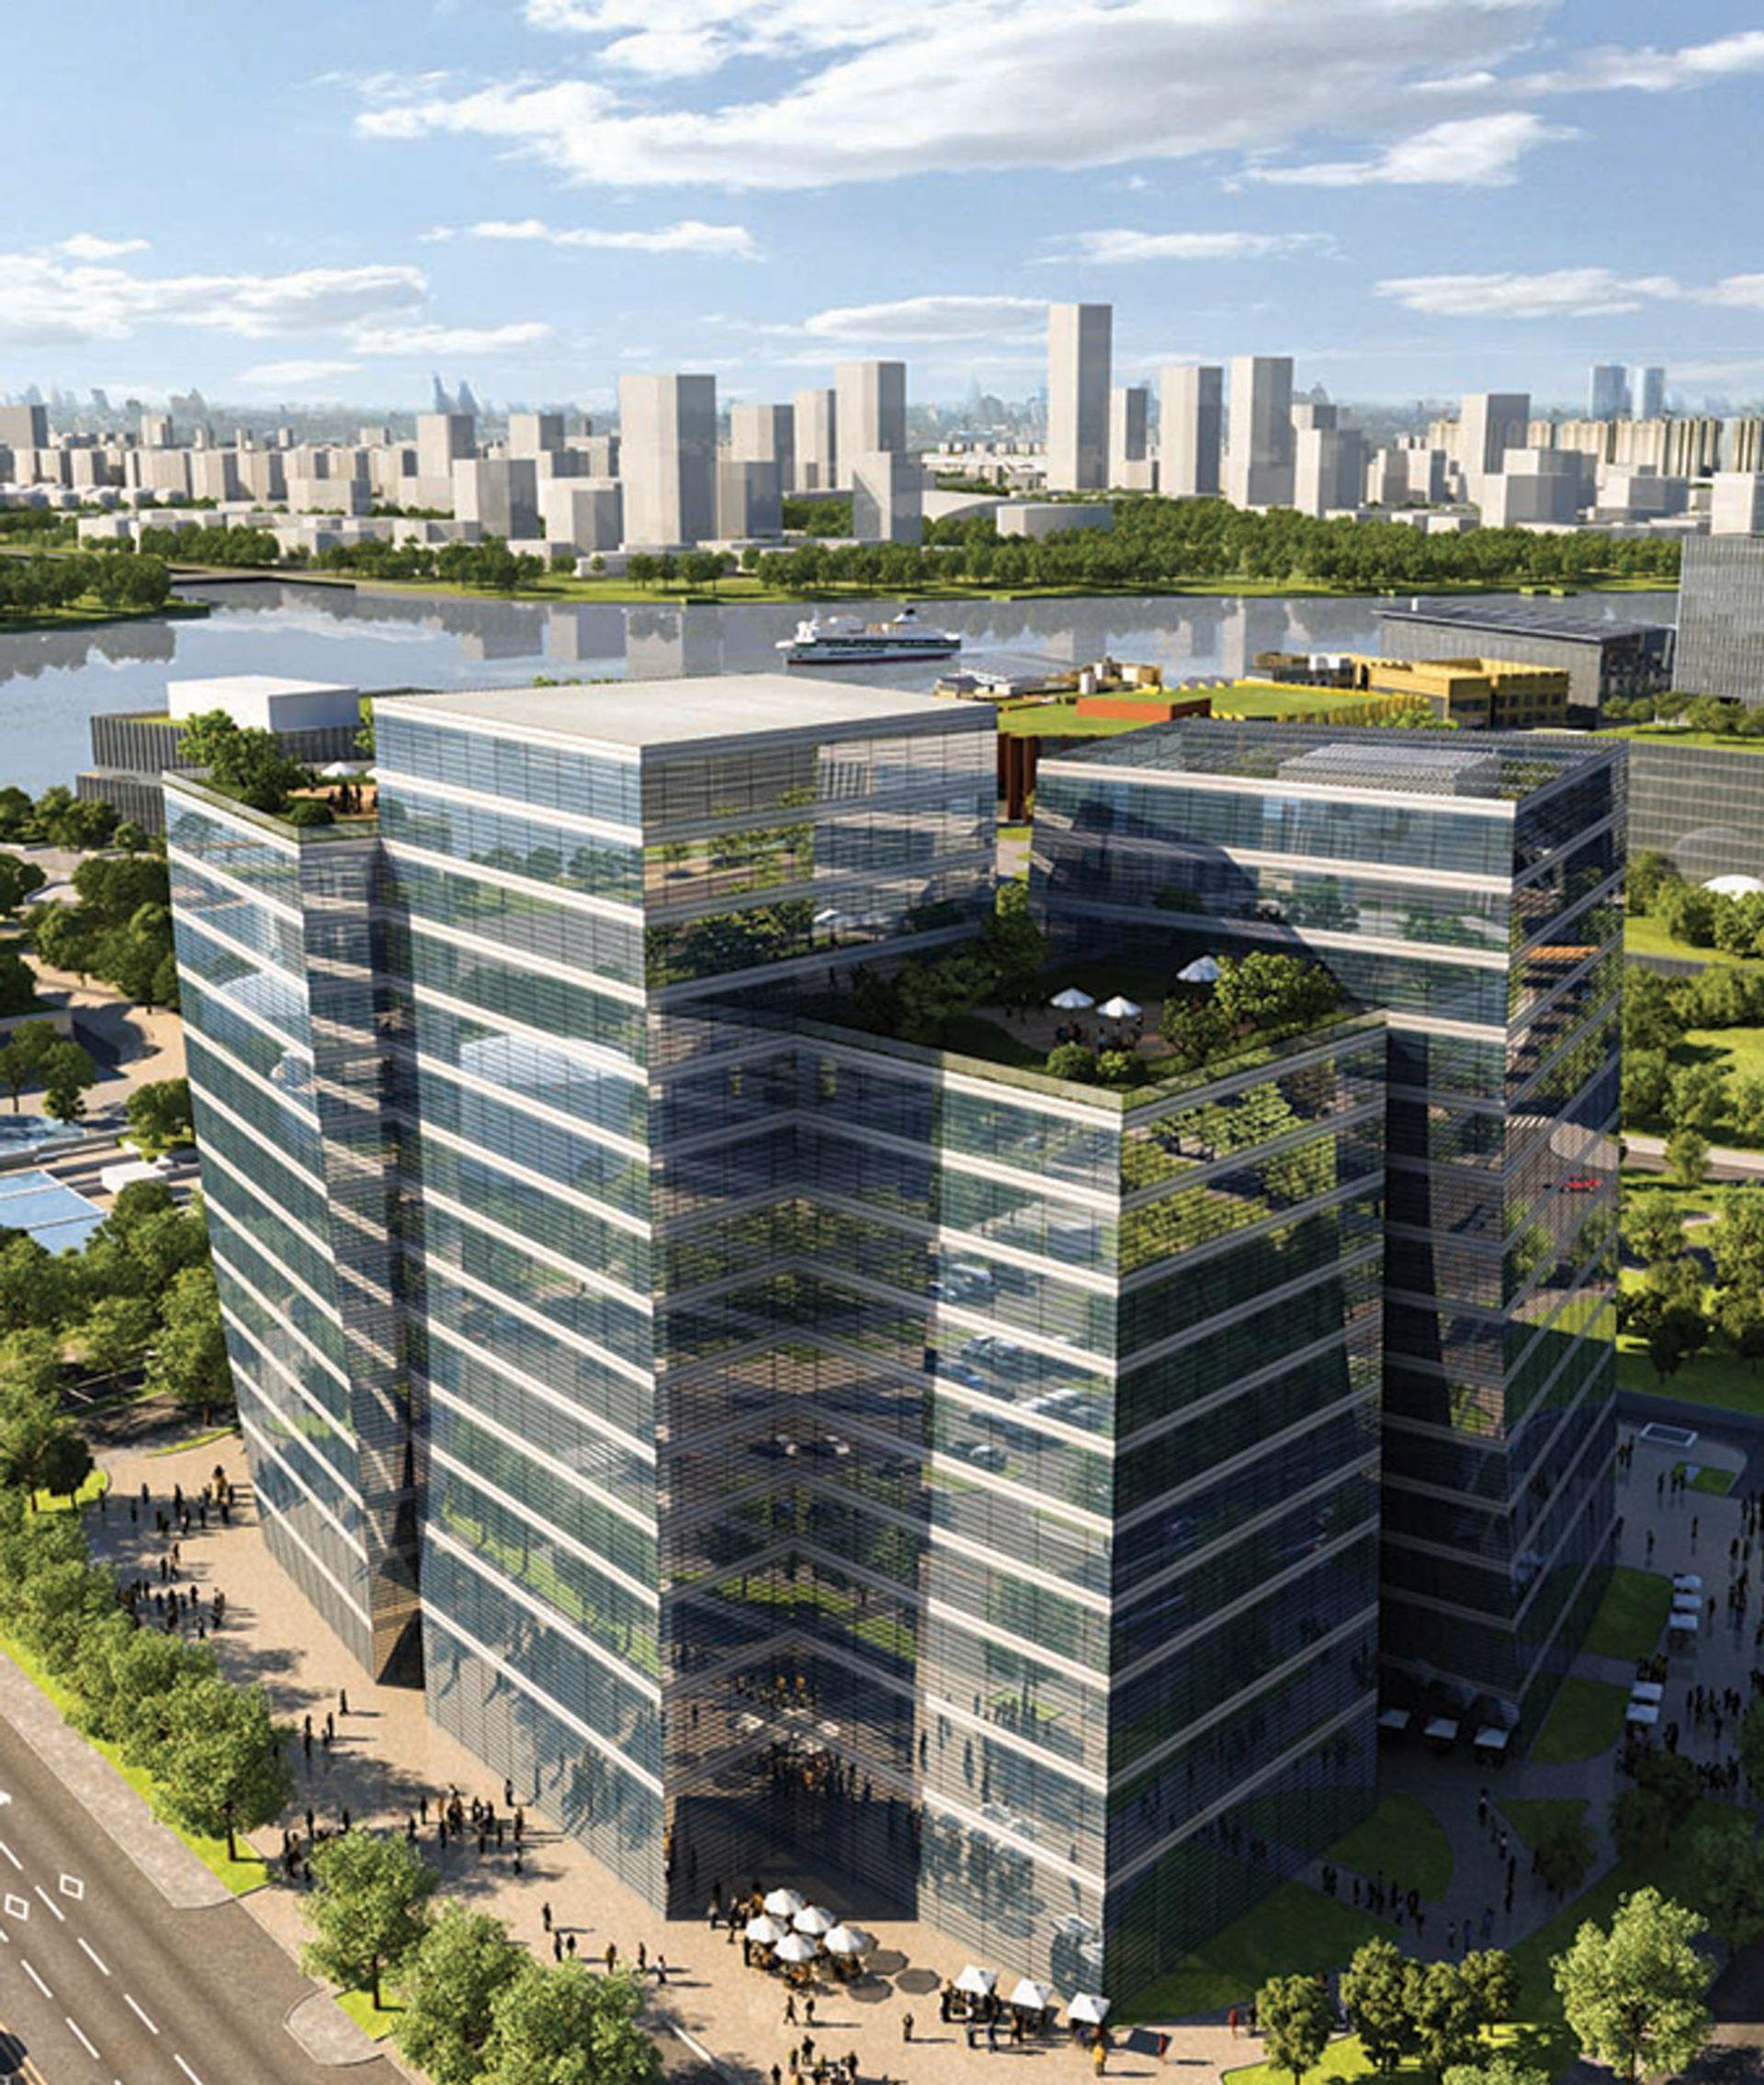 Shanghai's new Art Tower in West Bund aims to house 20 international galleries